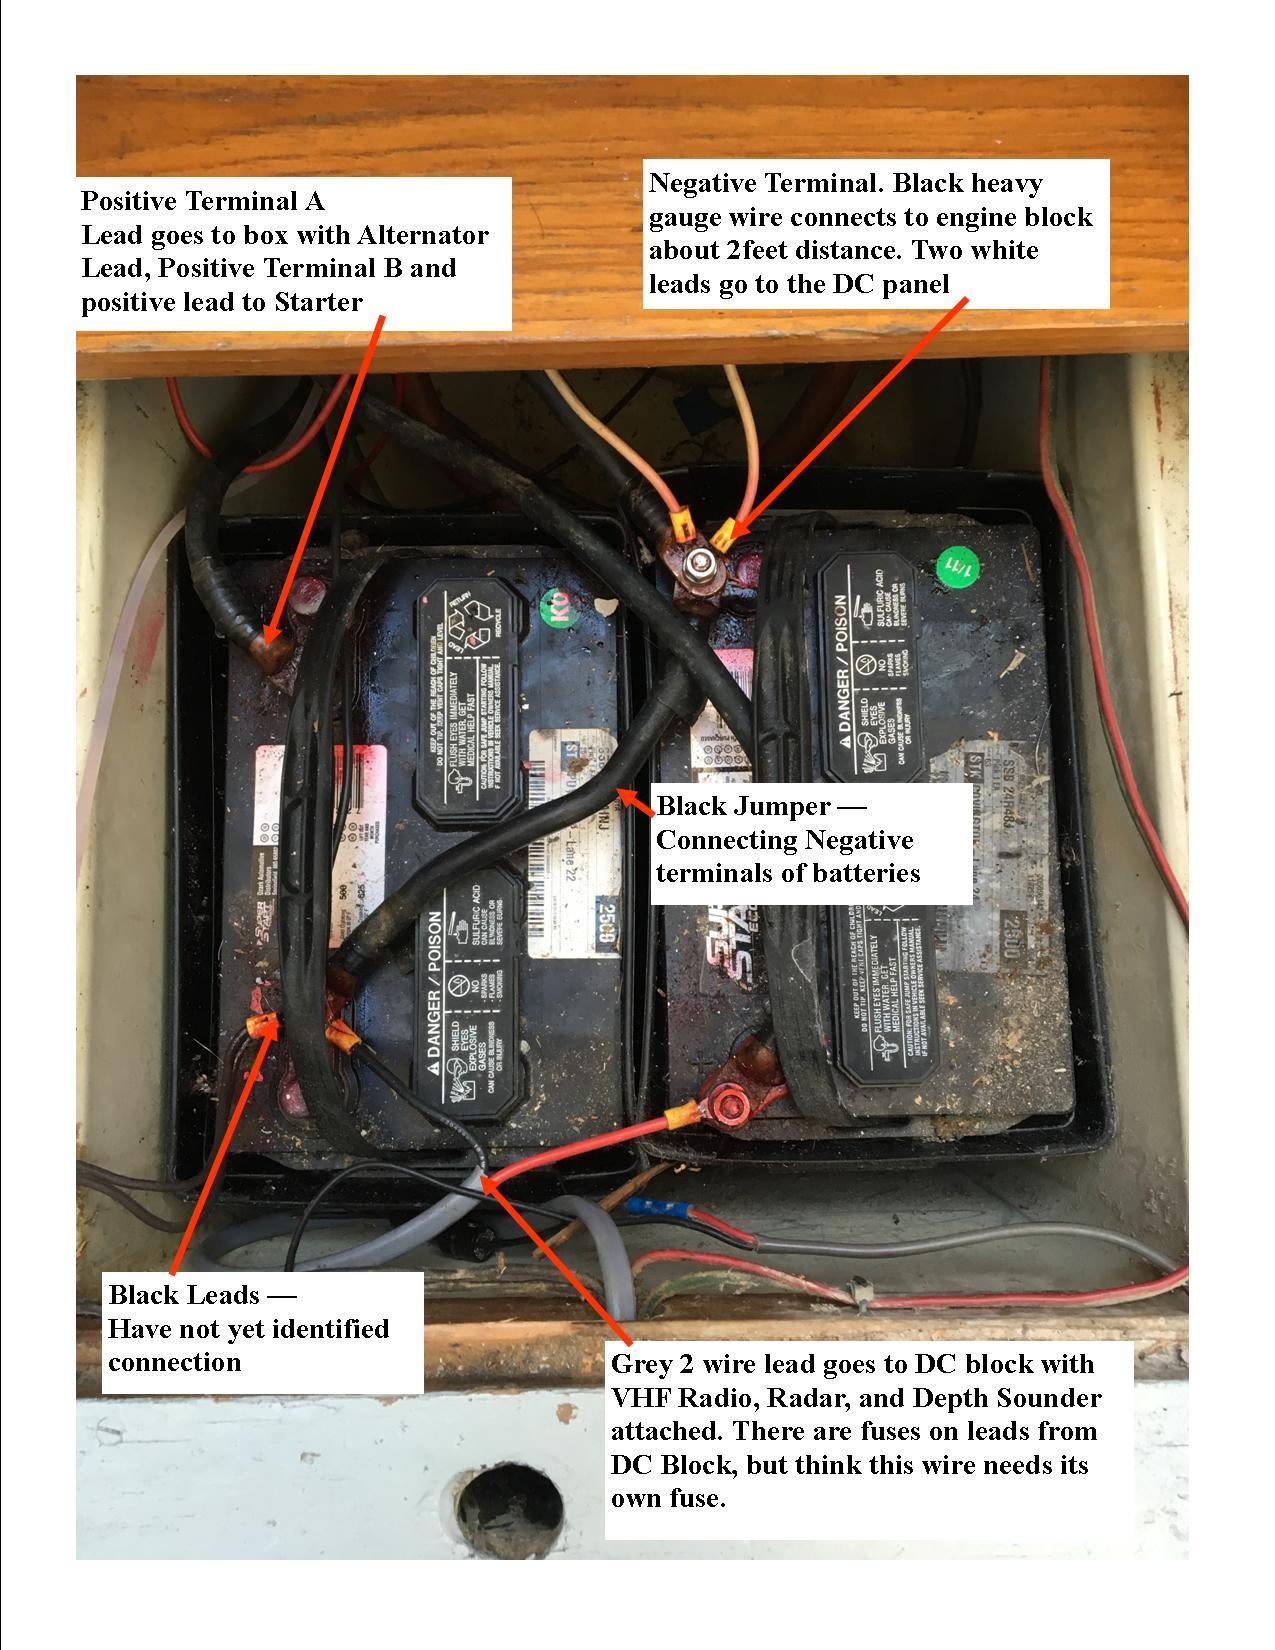 Wiring Diagram Symbols Circuit Breaker As Well As Basic Boat Wiring